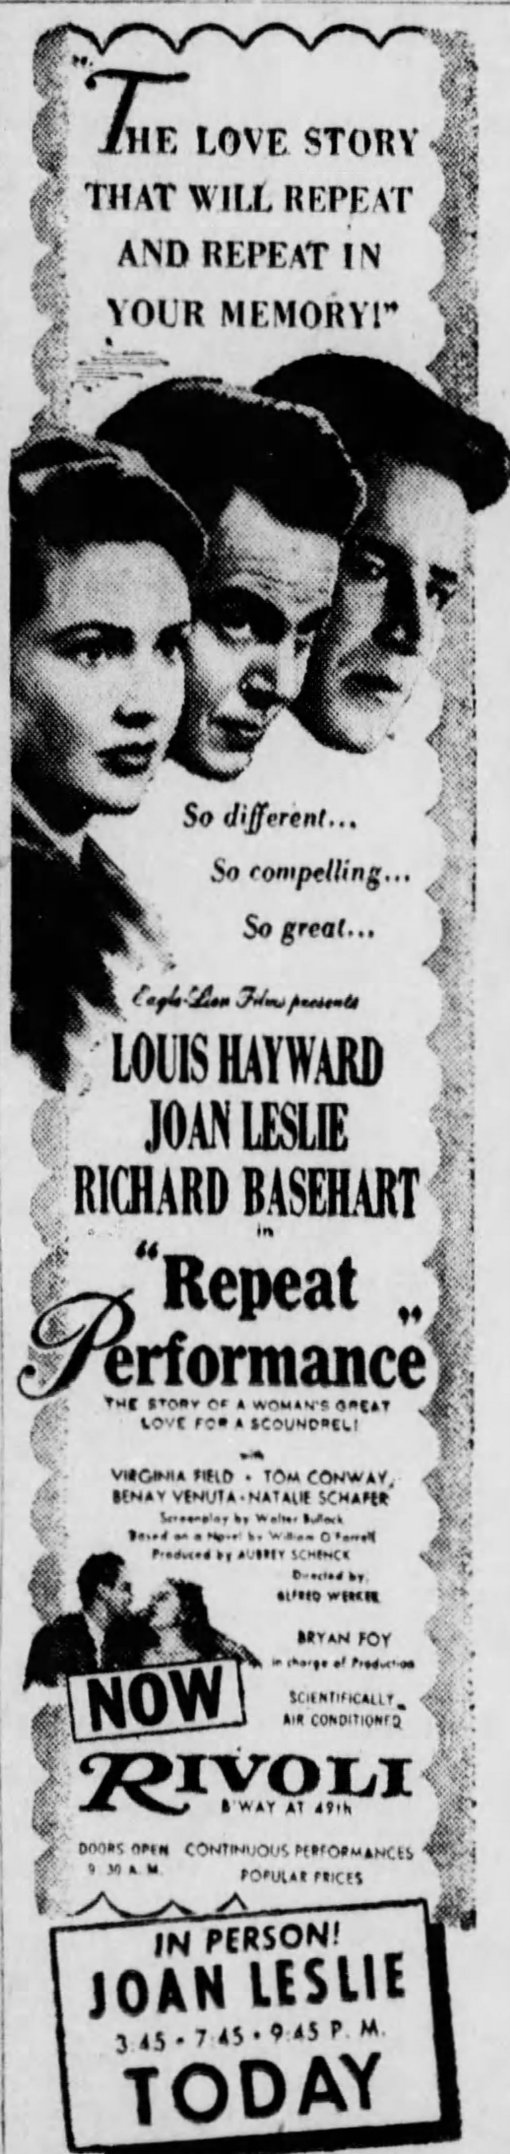 The_Brooklyn_Daily_Eagle_Tue__Jul_1__1947_